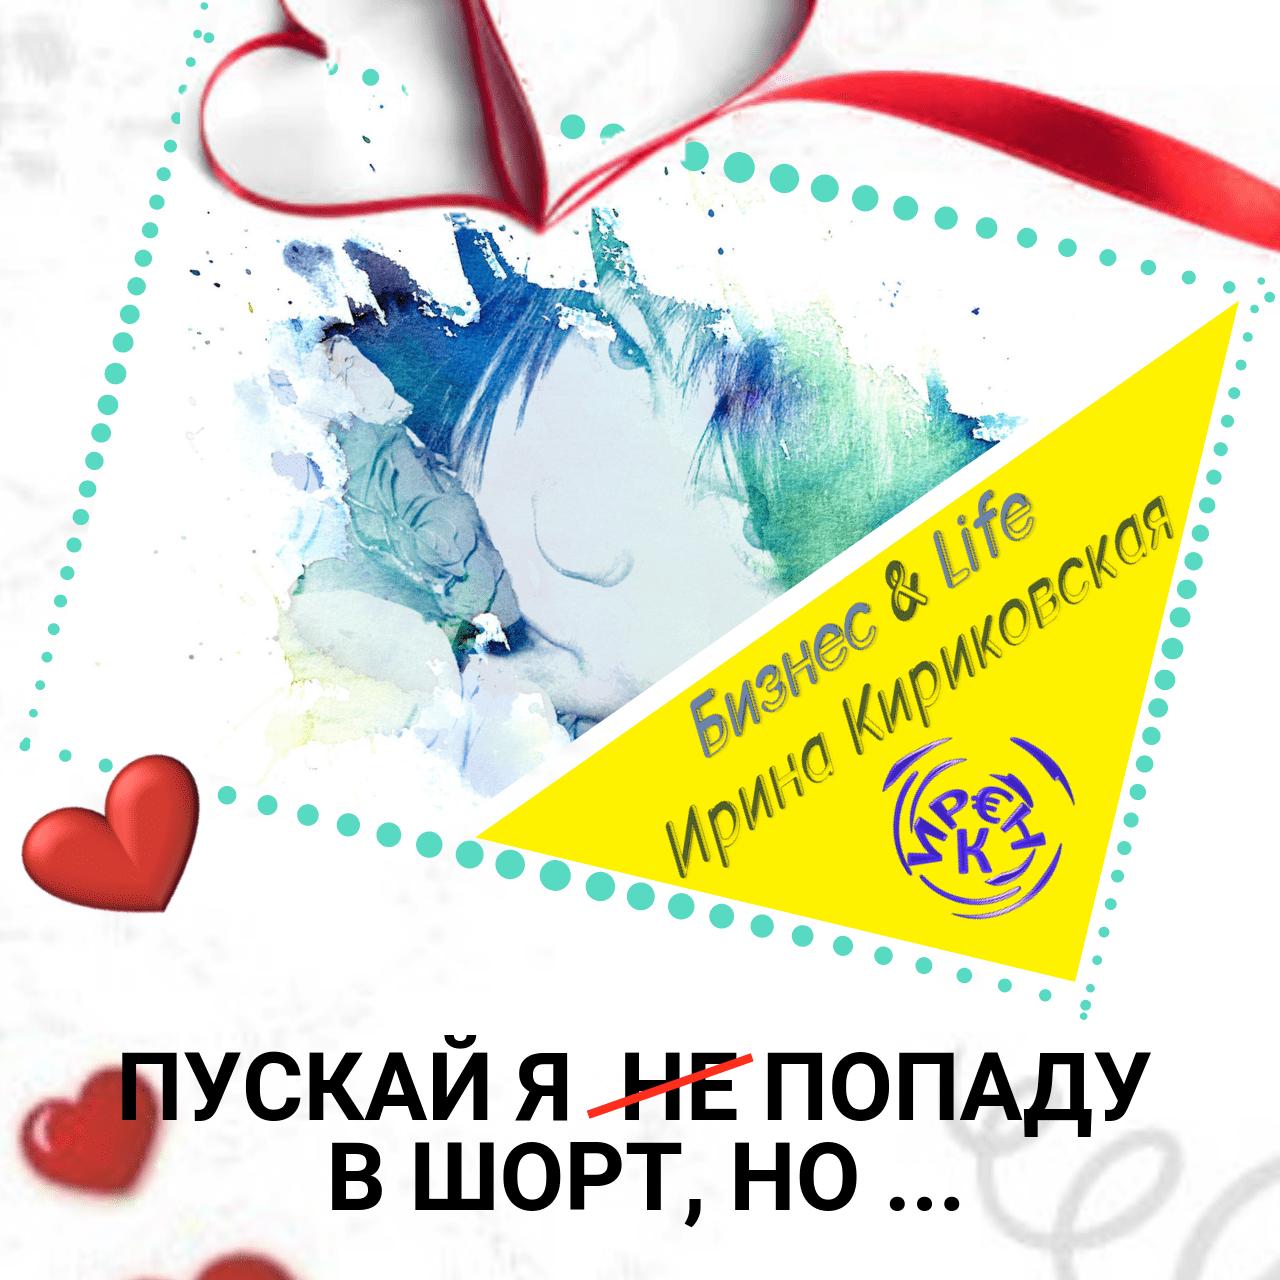 Пускай я не попаду в шорт, но ..., Ирина Кириковская, обо мне, моё мнение, моя позиция,